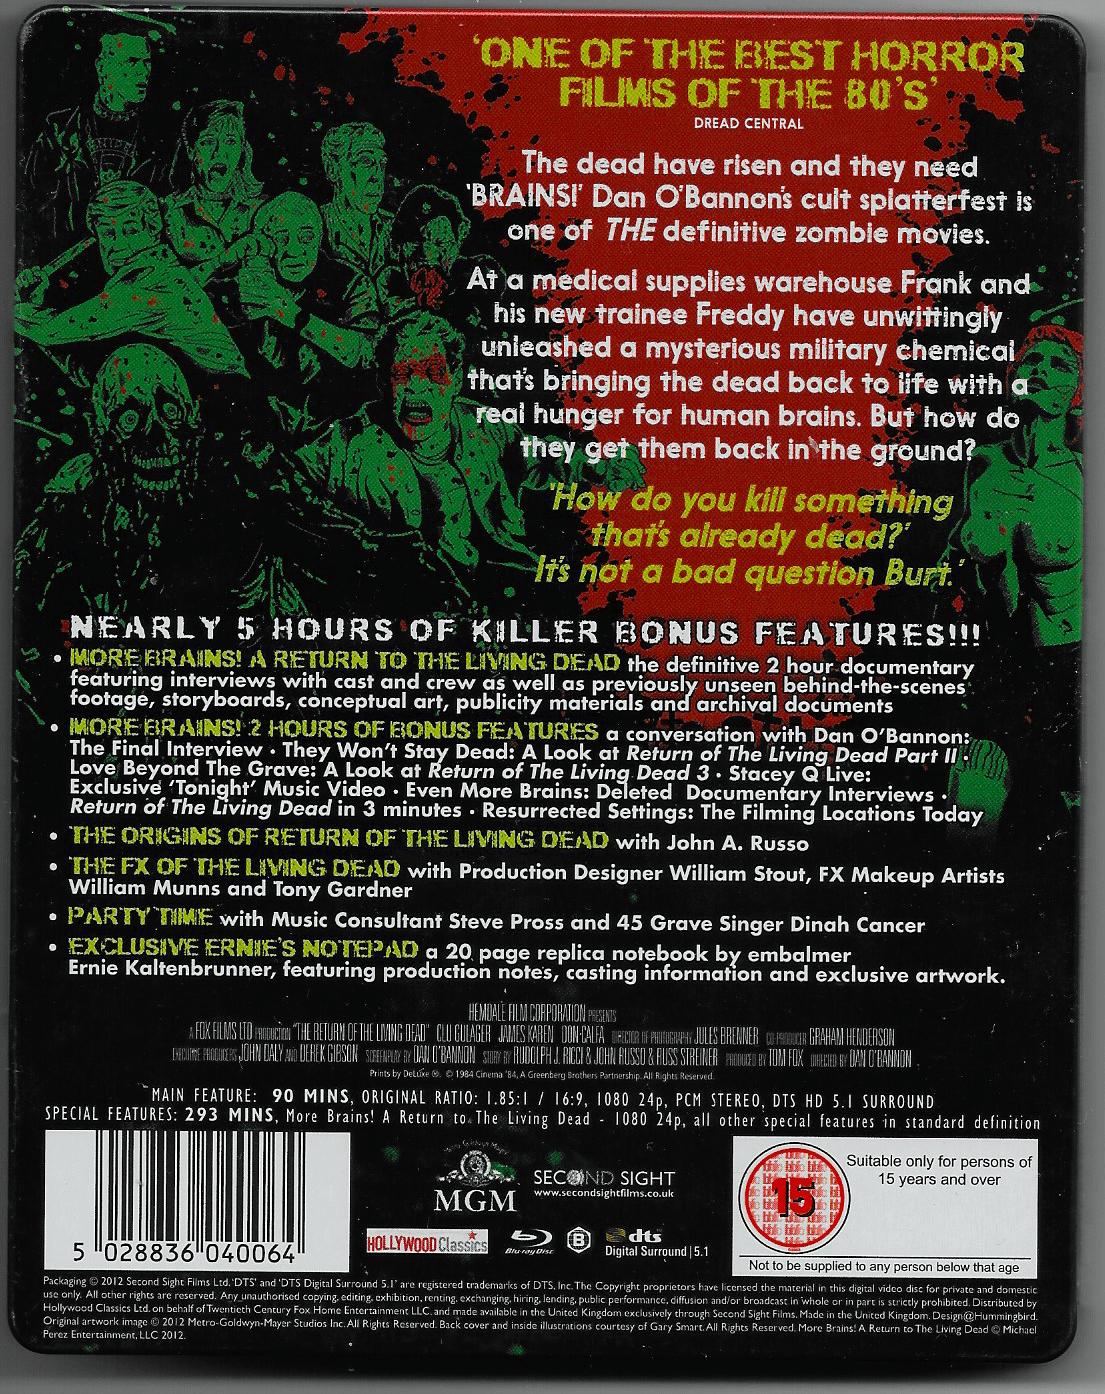 Blu Ray Steelbook, Back.